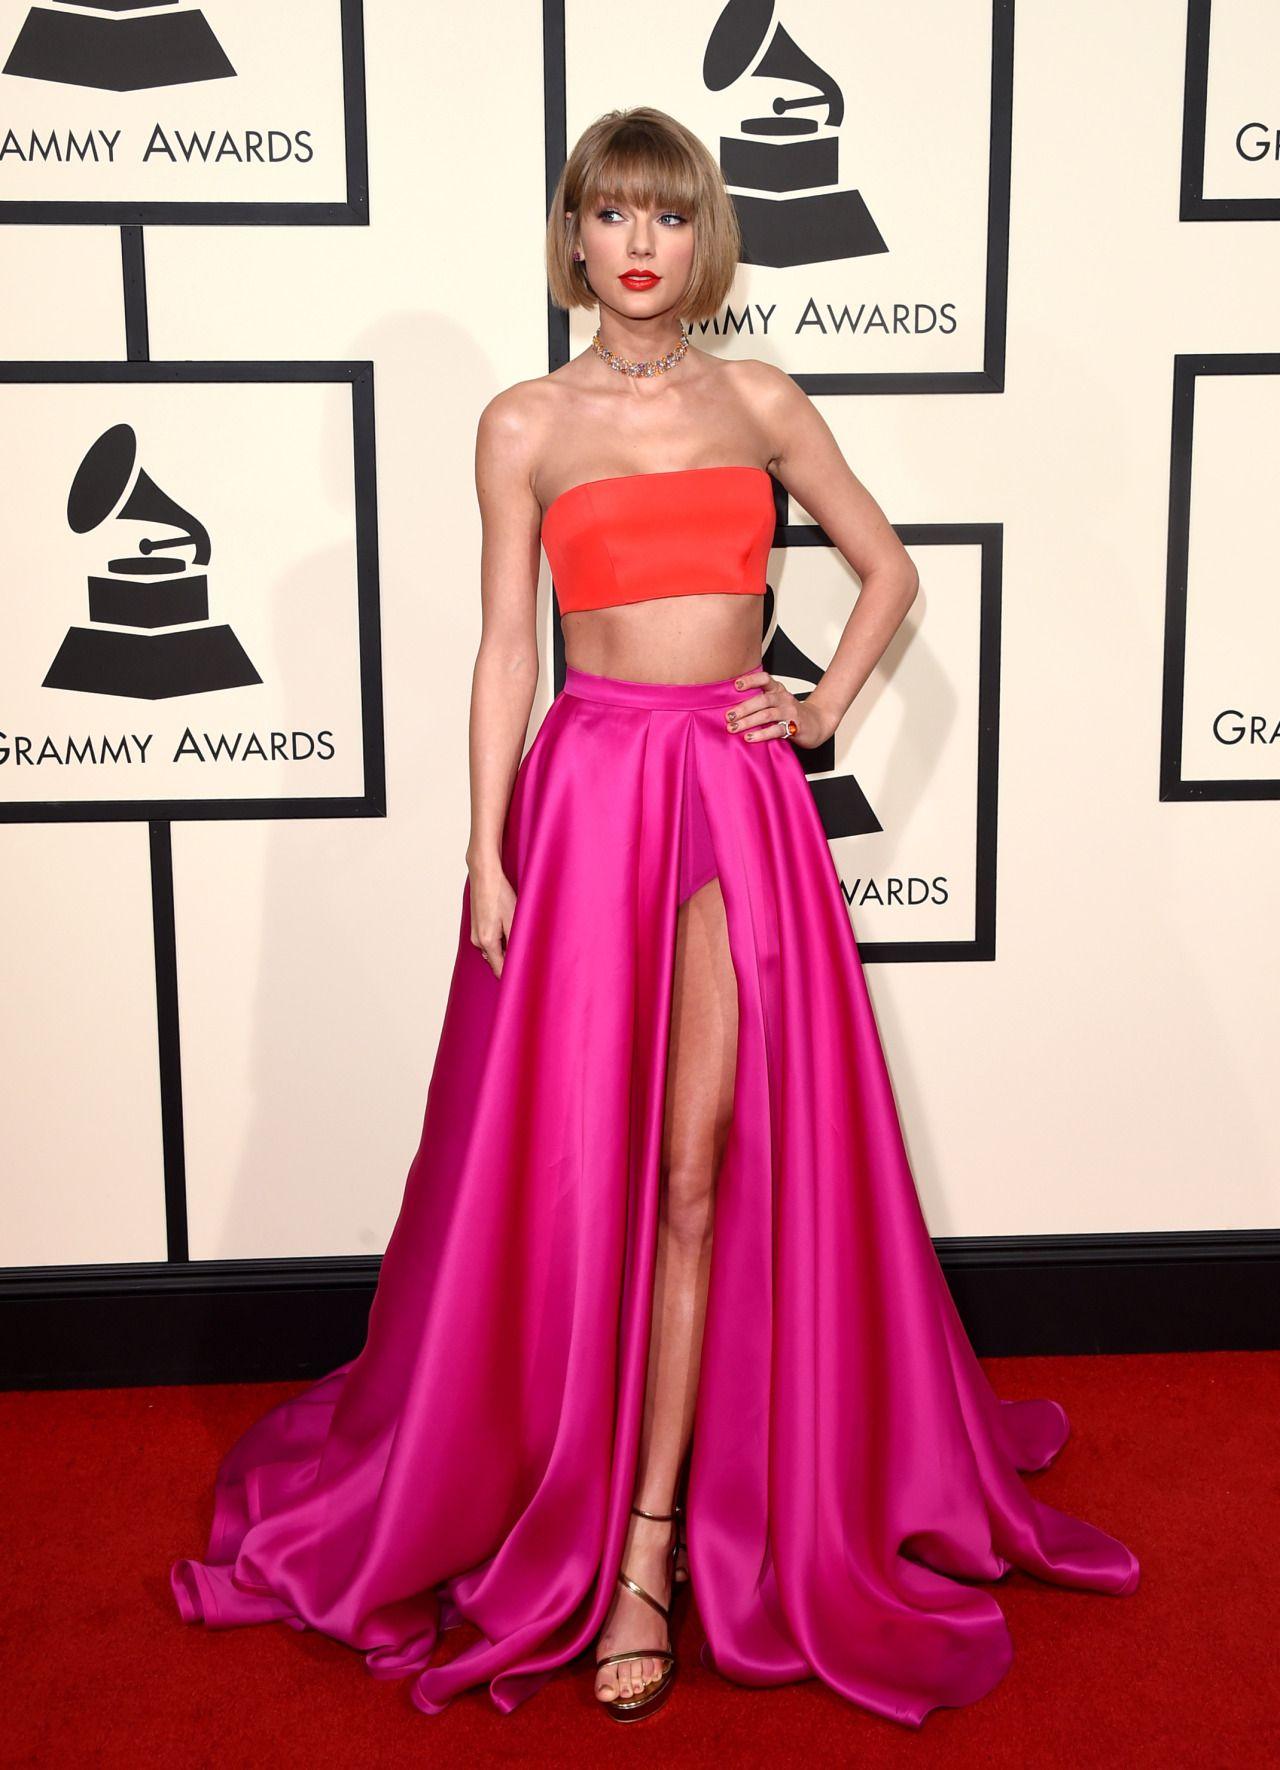 Taylor Swift photo gallery | Taylor Swift | Pinterest